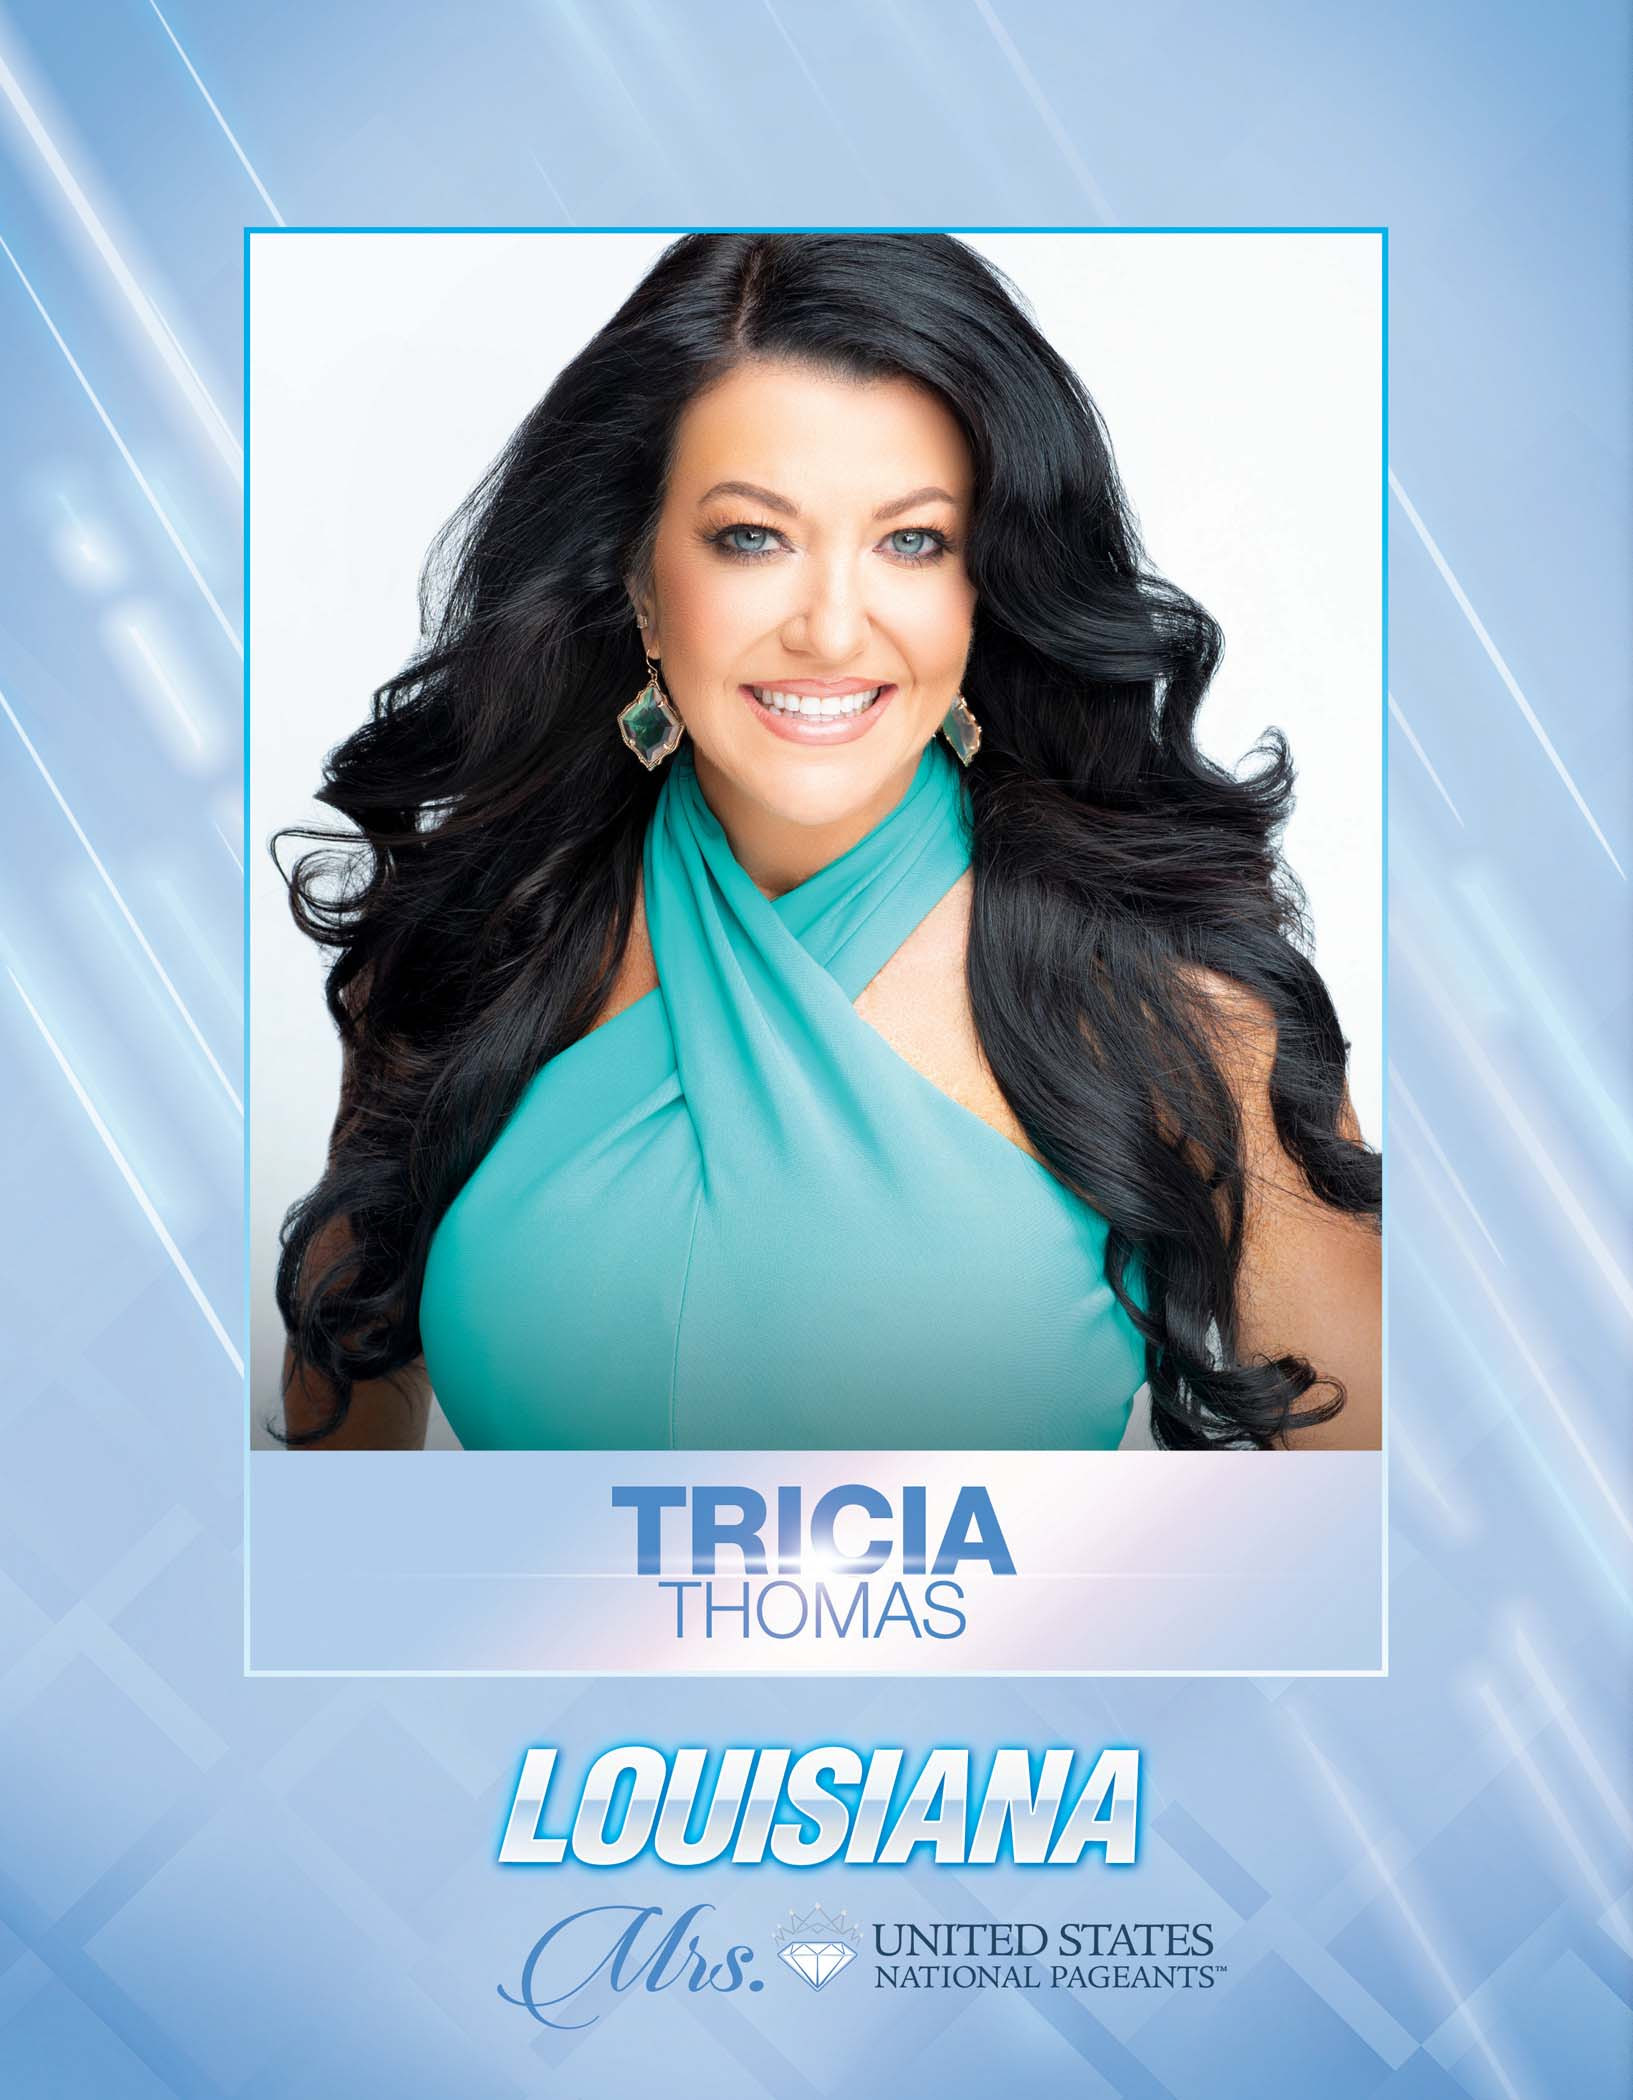 Tricia Thomas Mrs. Louisiana United States - 2021